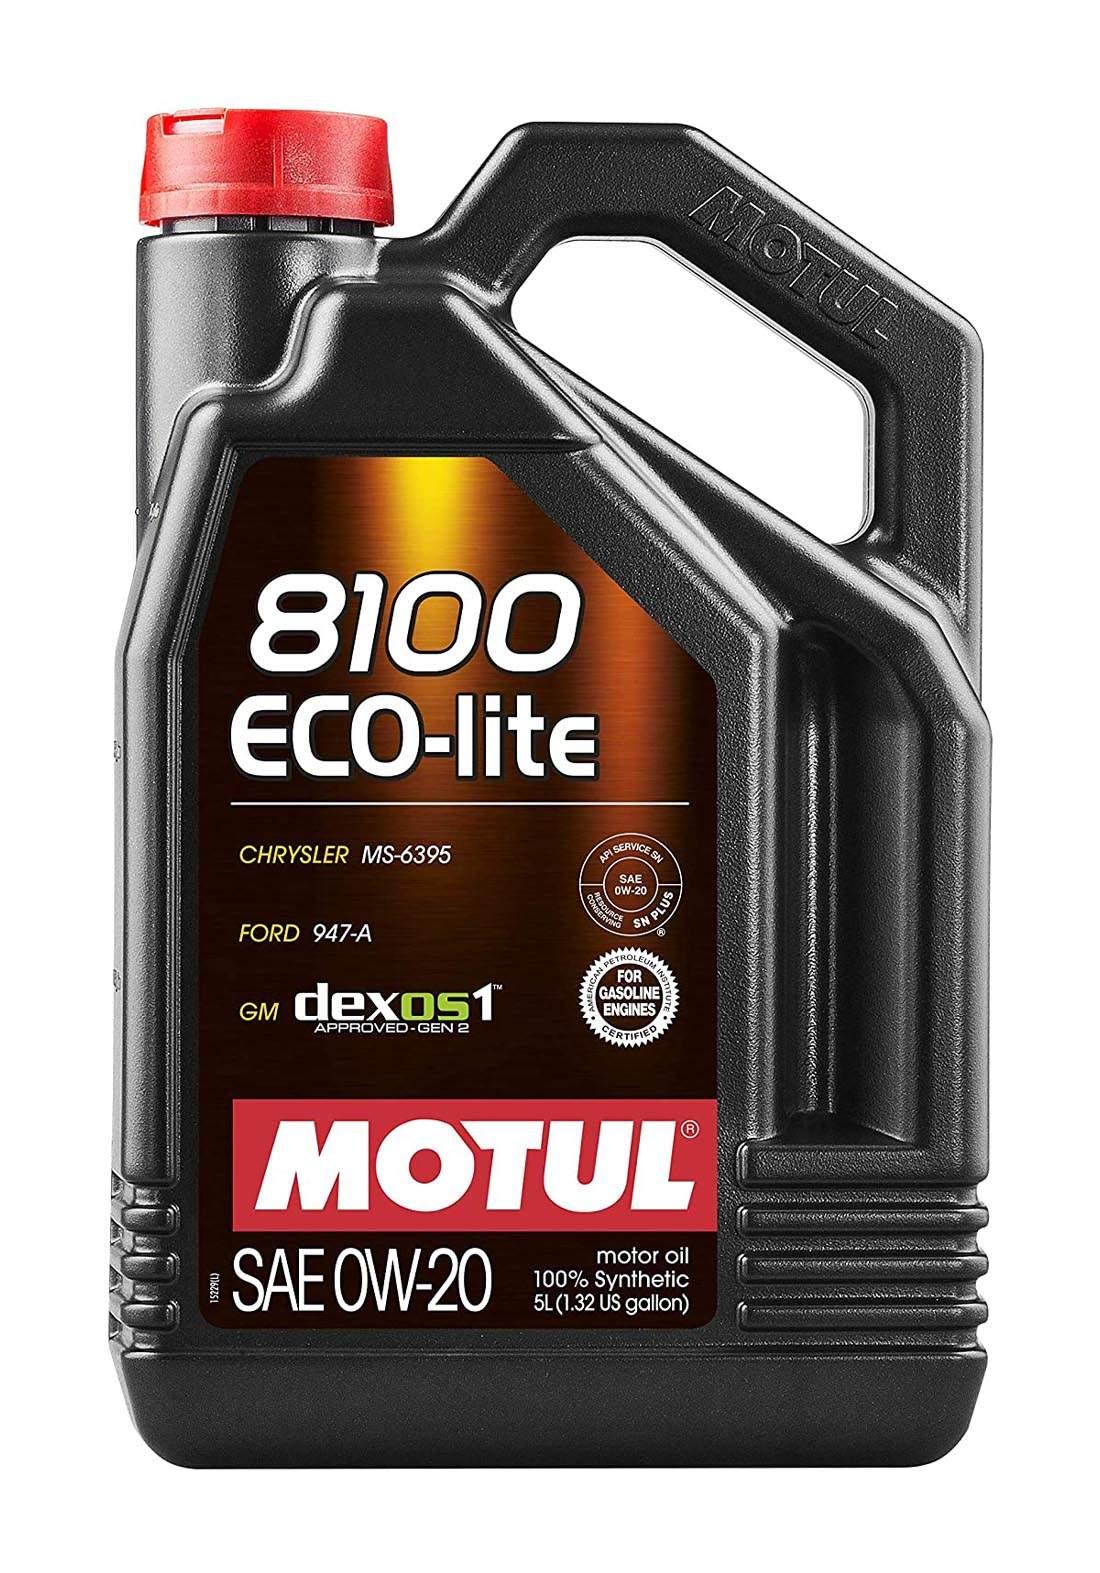 Motul 0w20 Eco-lite 8100 Synthetic Oil 5L  زيت تخليقي 100% للسيارات